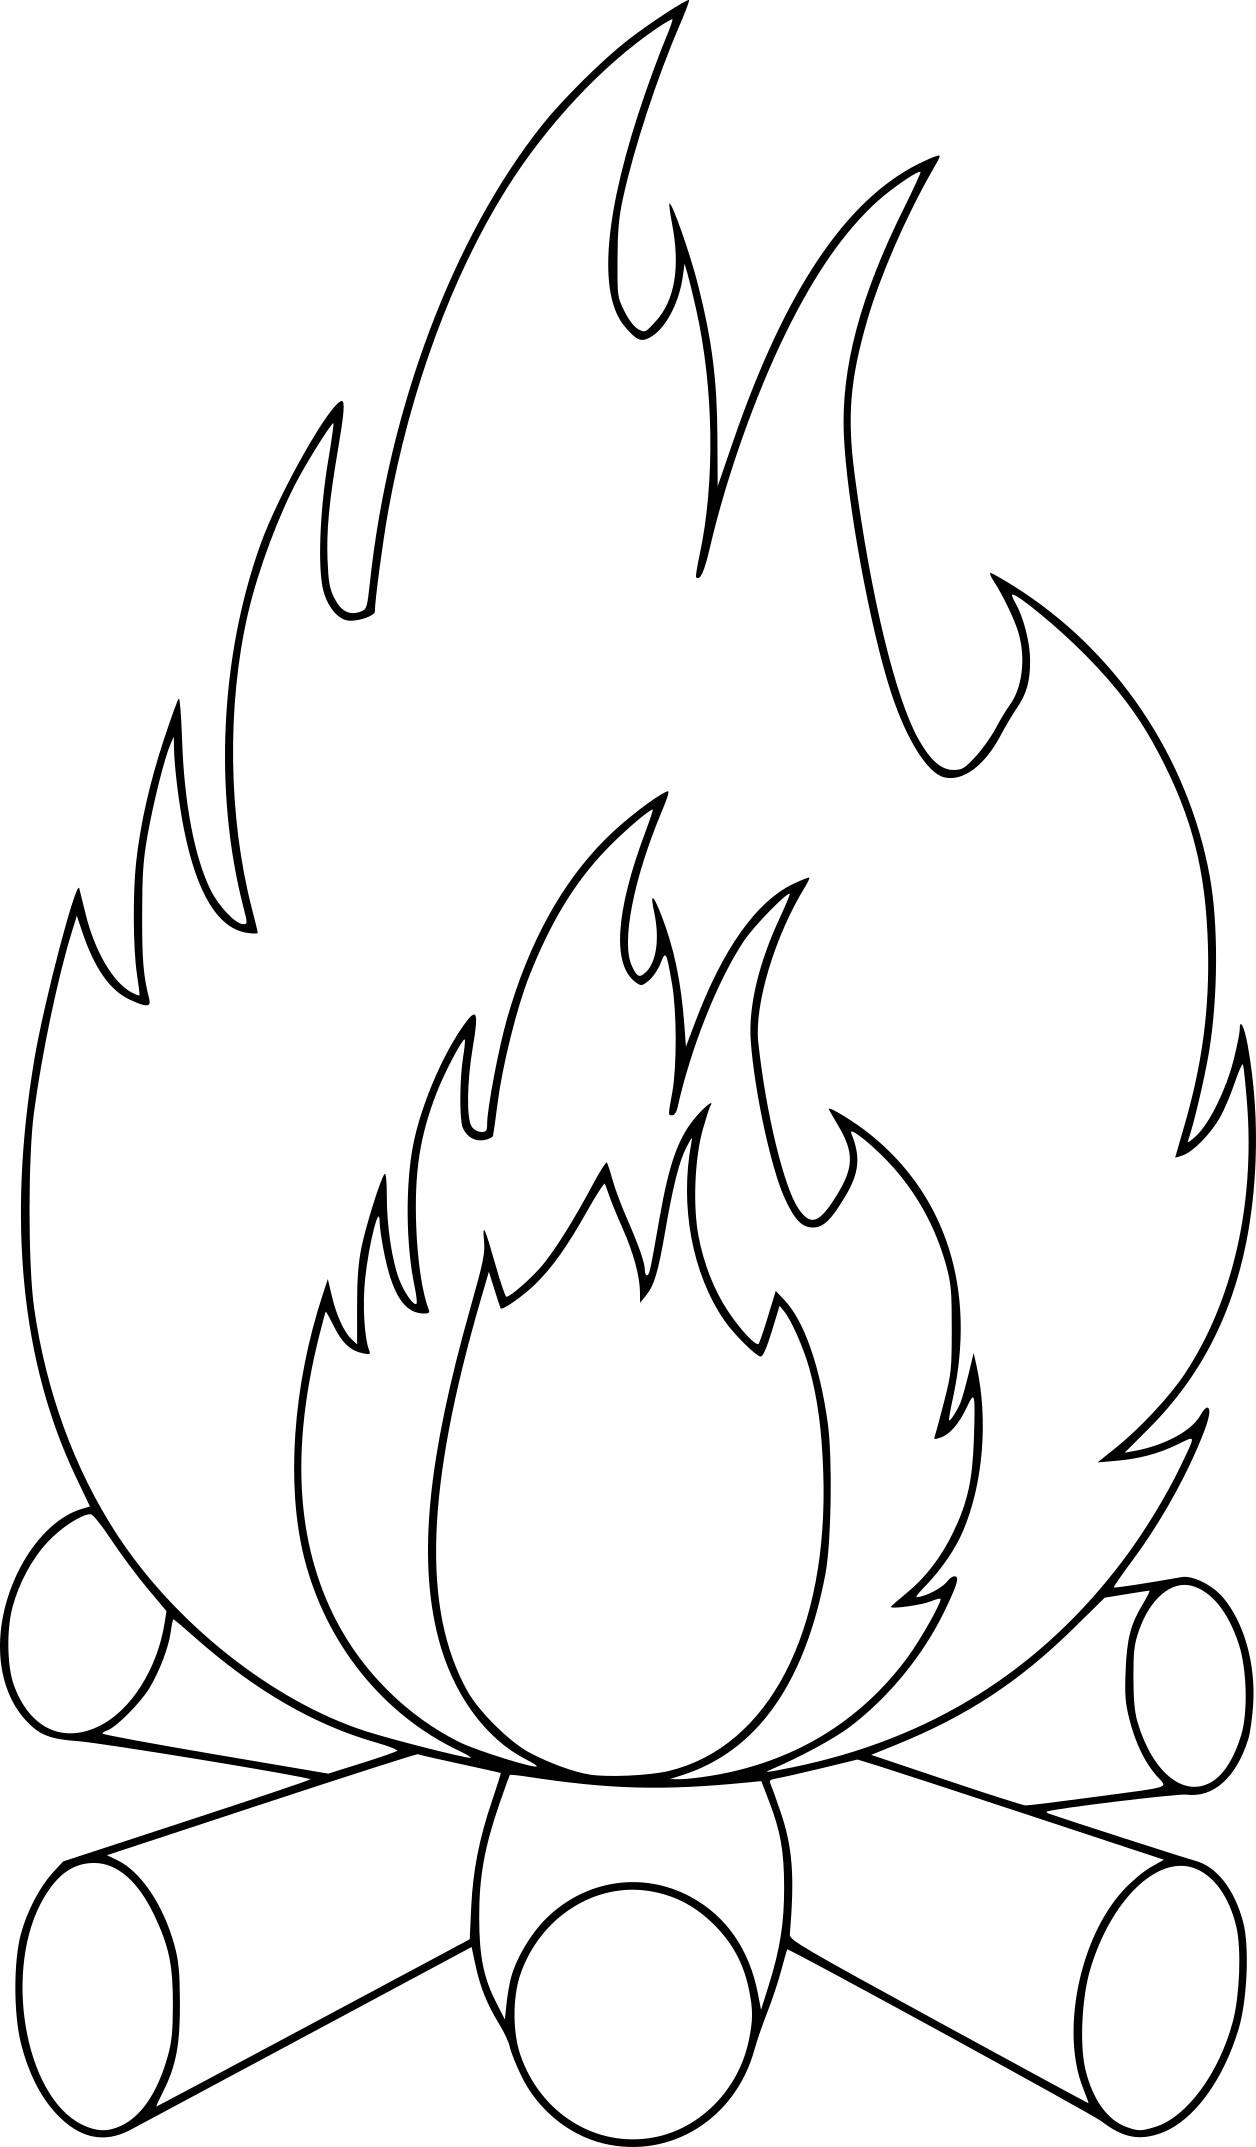 Coloriage feu de camp et dessin à imprimer